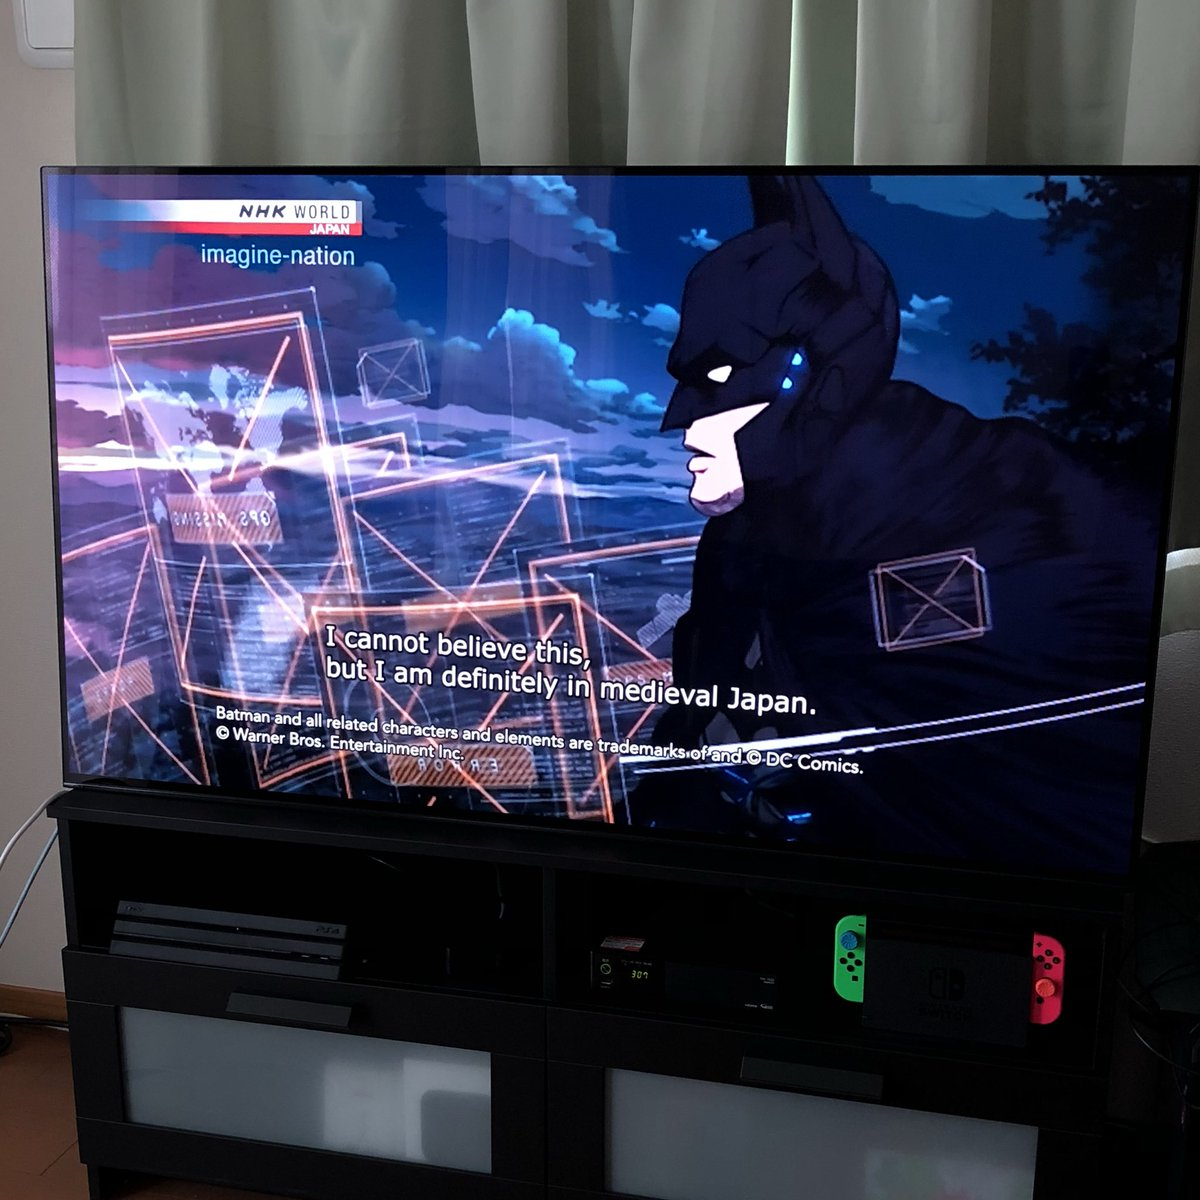 test ツイッターメディア - NHKワールドでニンジャバットマンの特集やってるぞい https://t.co/tmdC1KhJwa